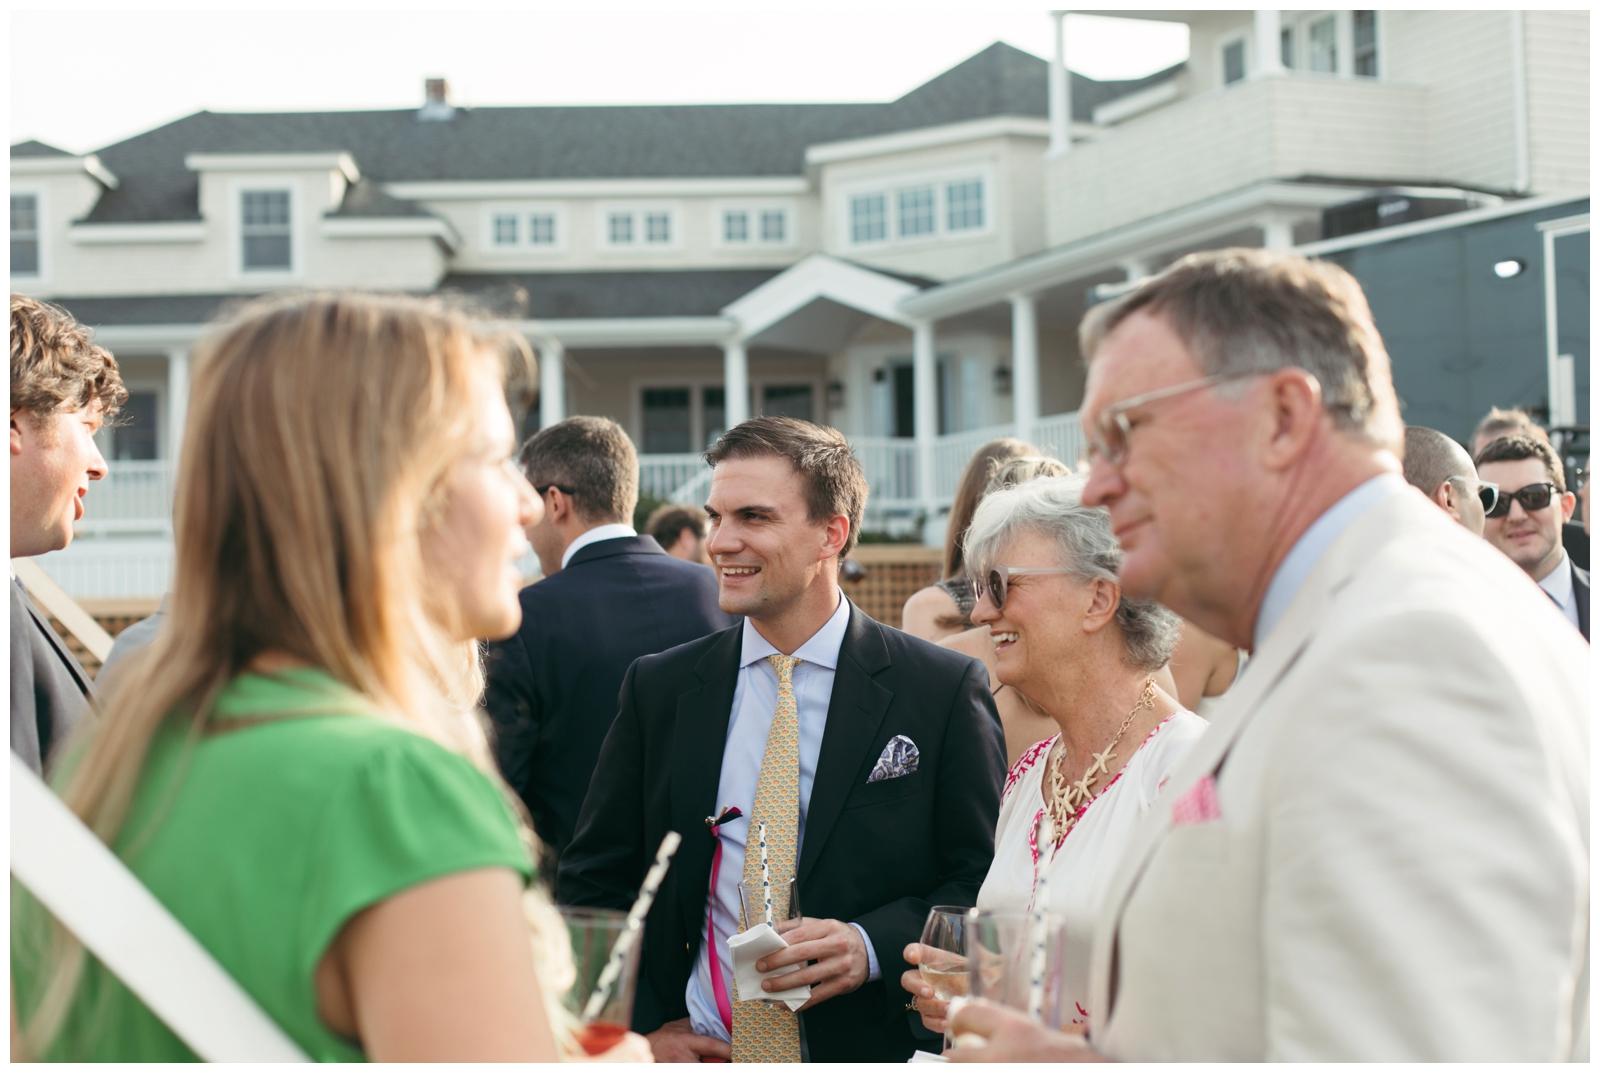 Bailey-Q-Photo-Backyard-Wedding-South-Shore-Boston-Wedding-Photographer-075.jpg